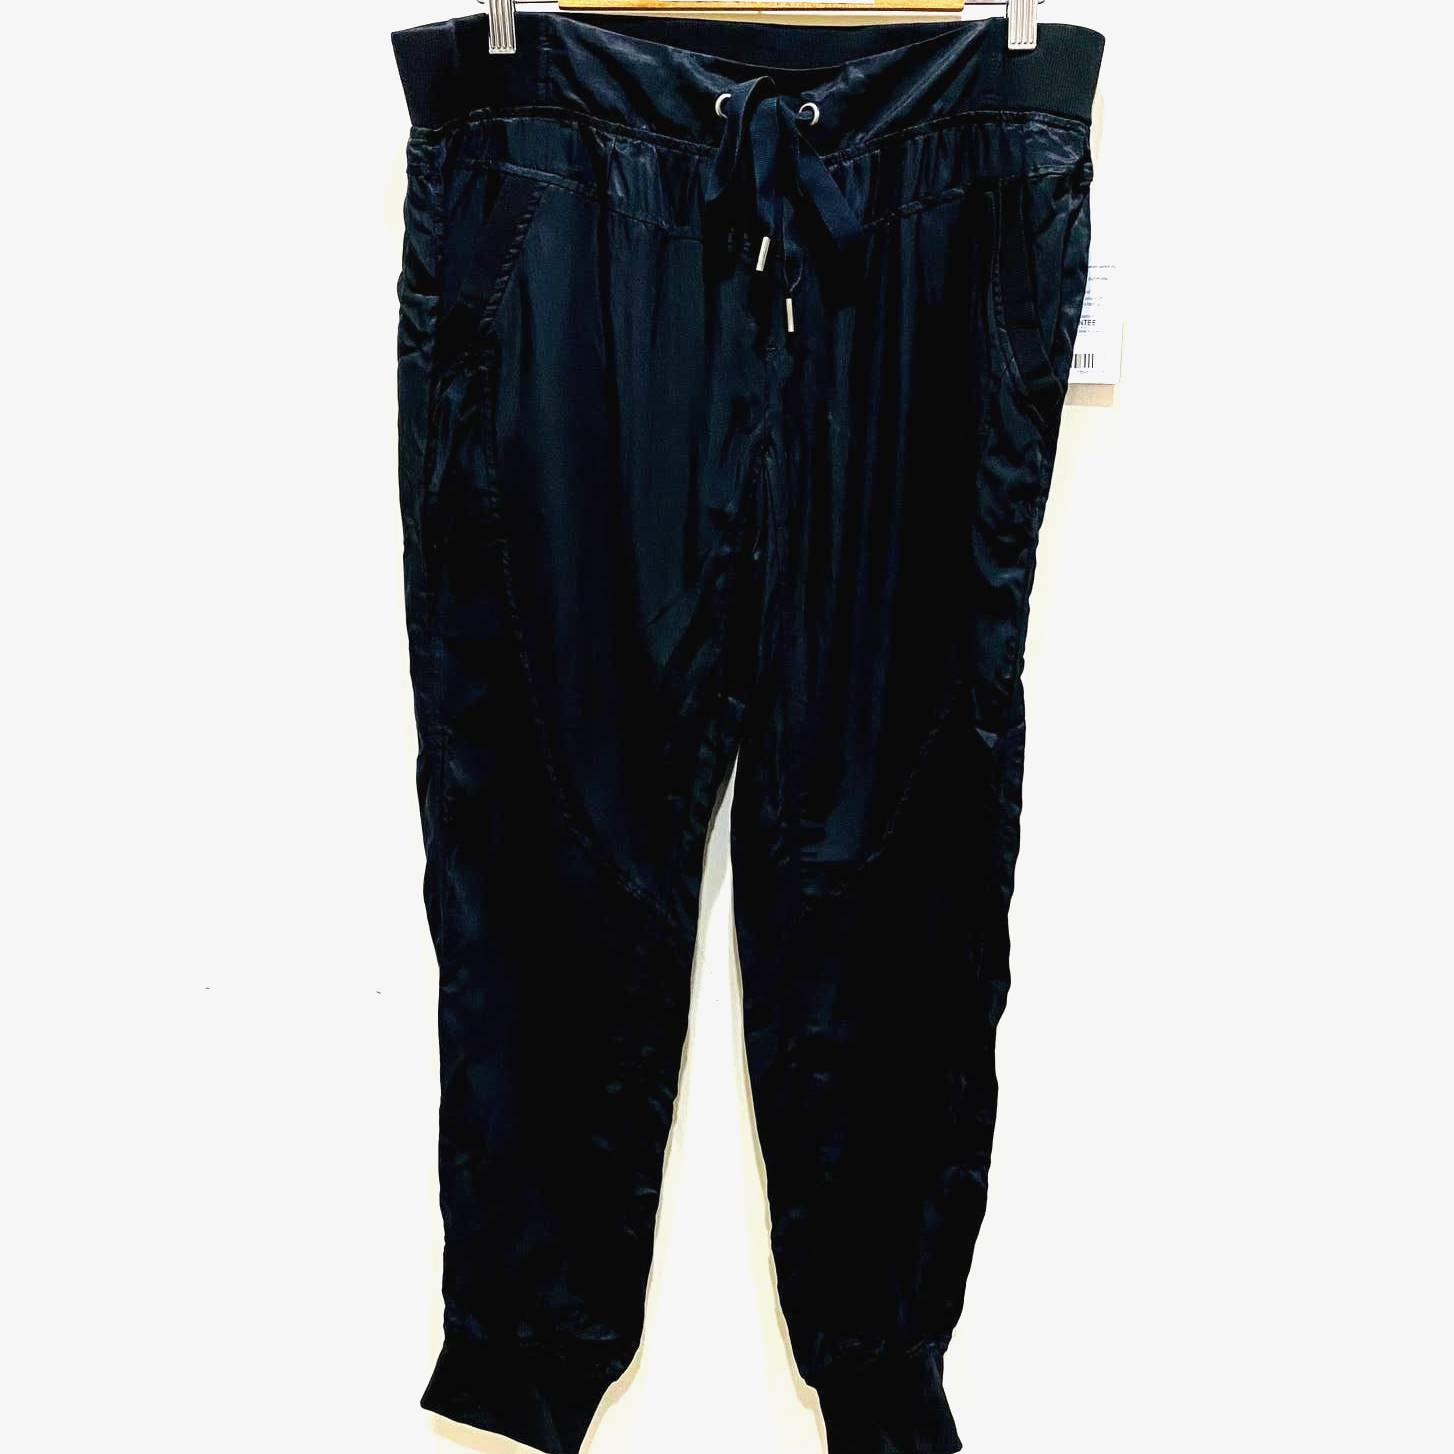 Athleta Black Sutra Jogger Lounge Pants